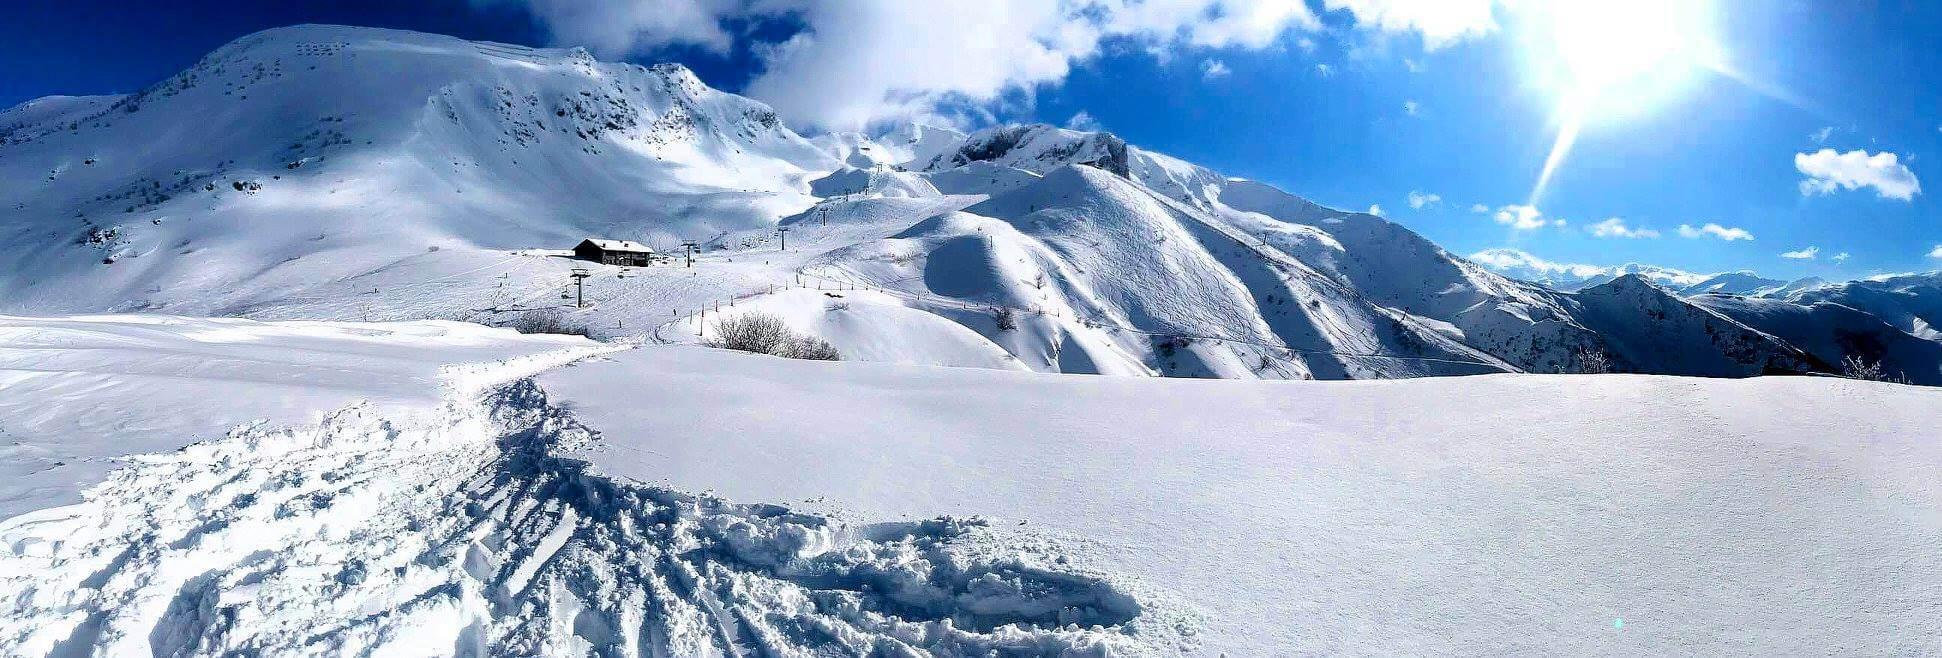 La Riserva Bianca, Limone Piemonte